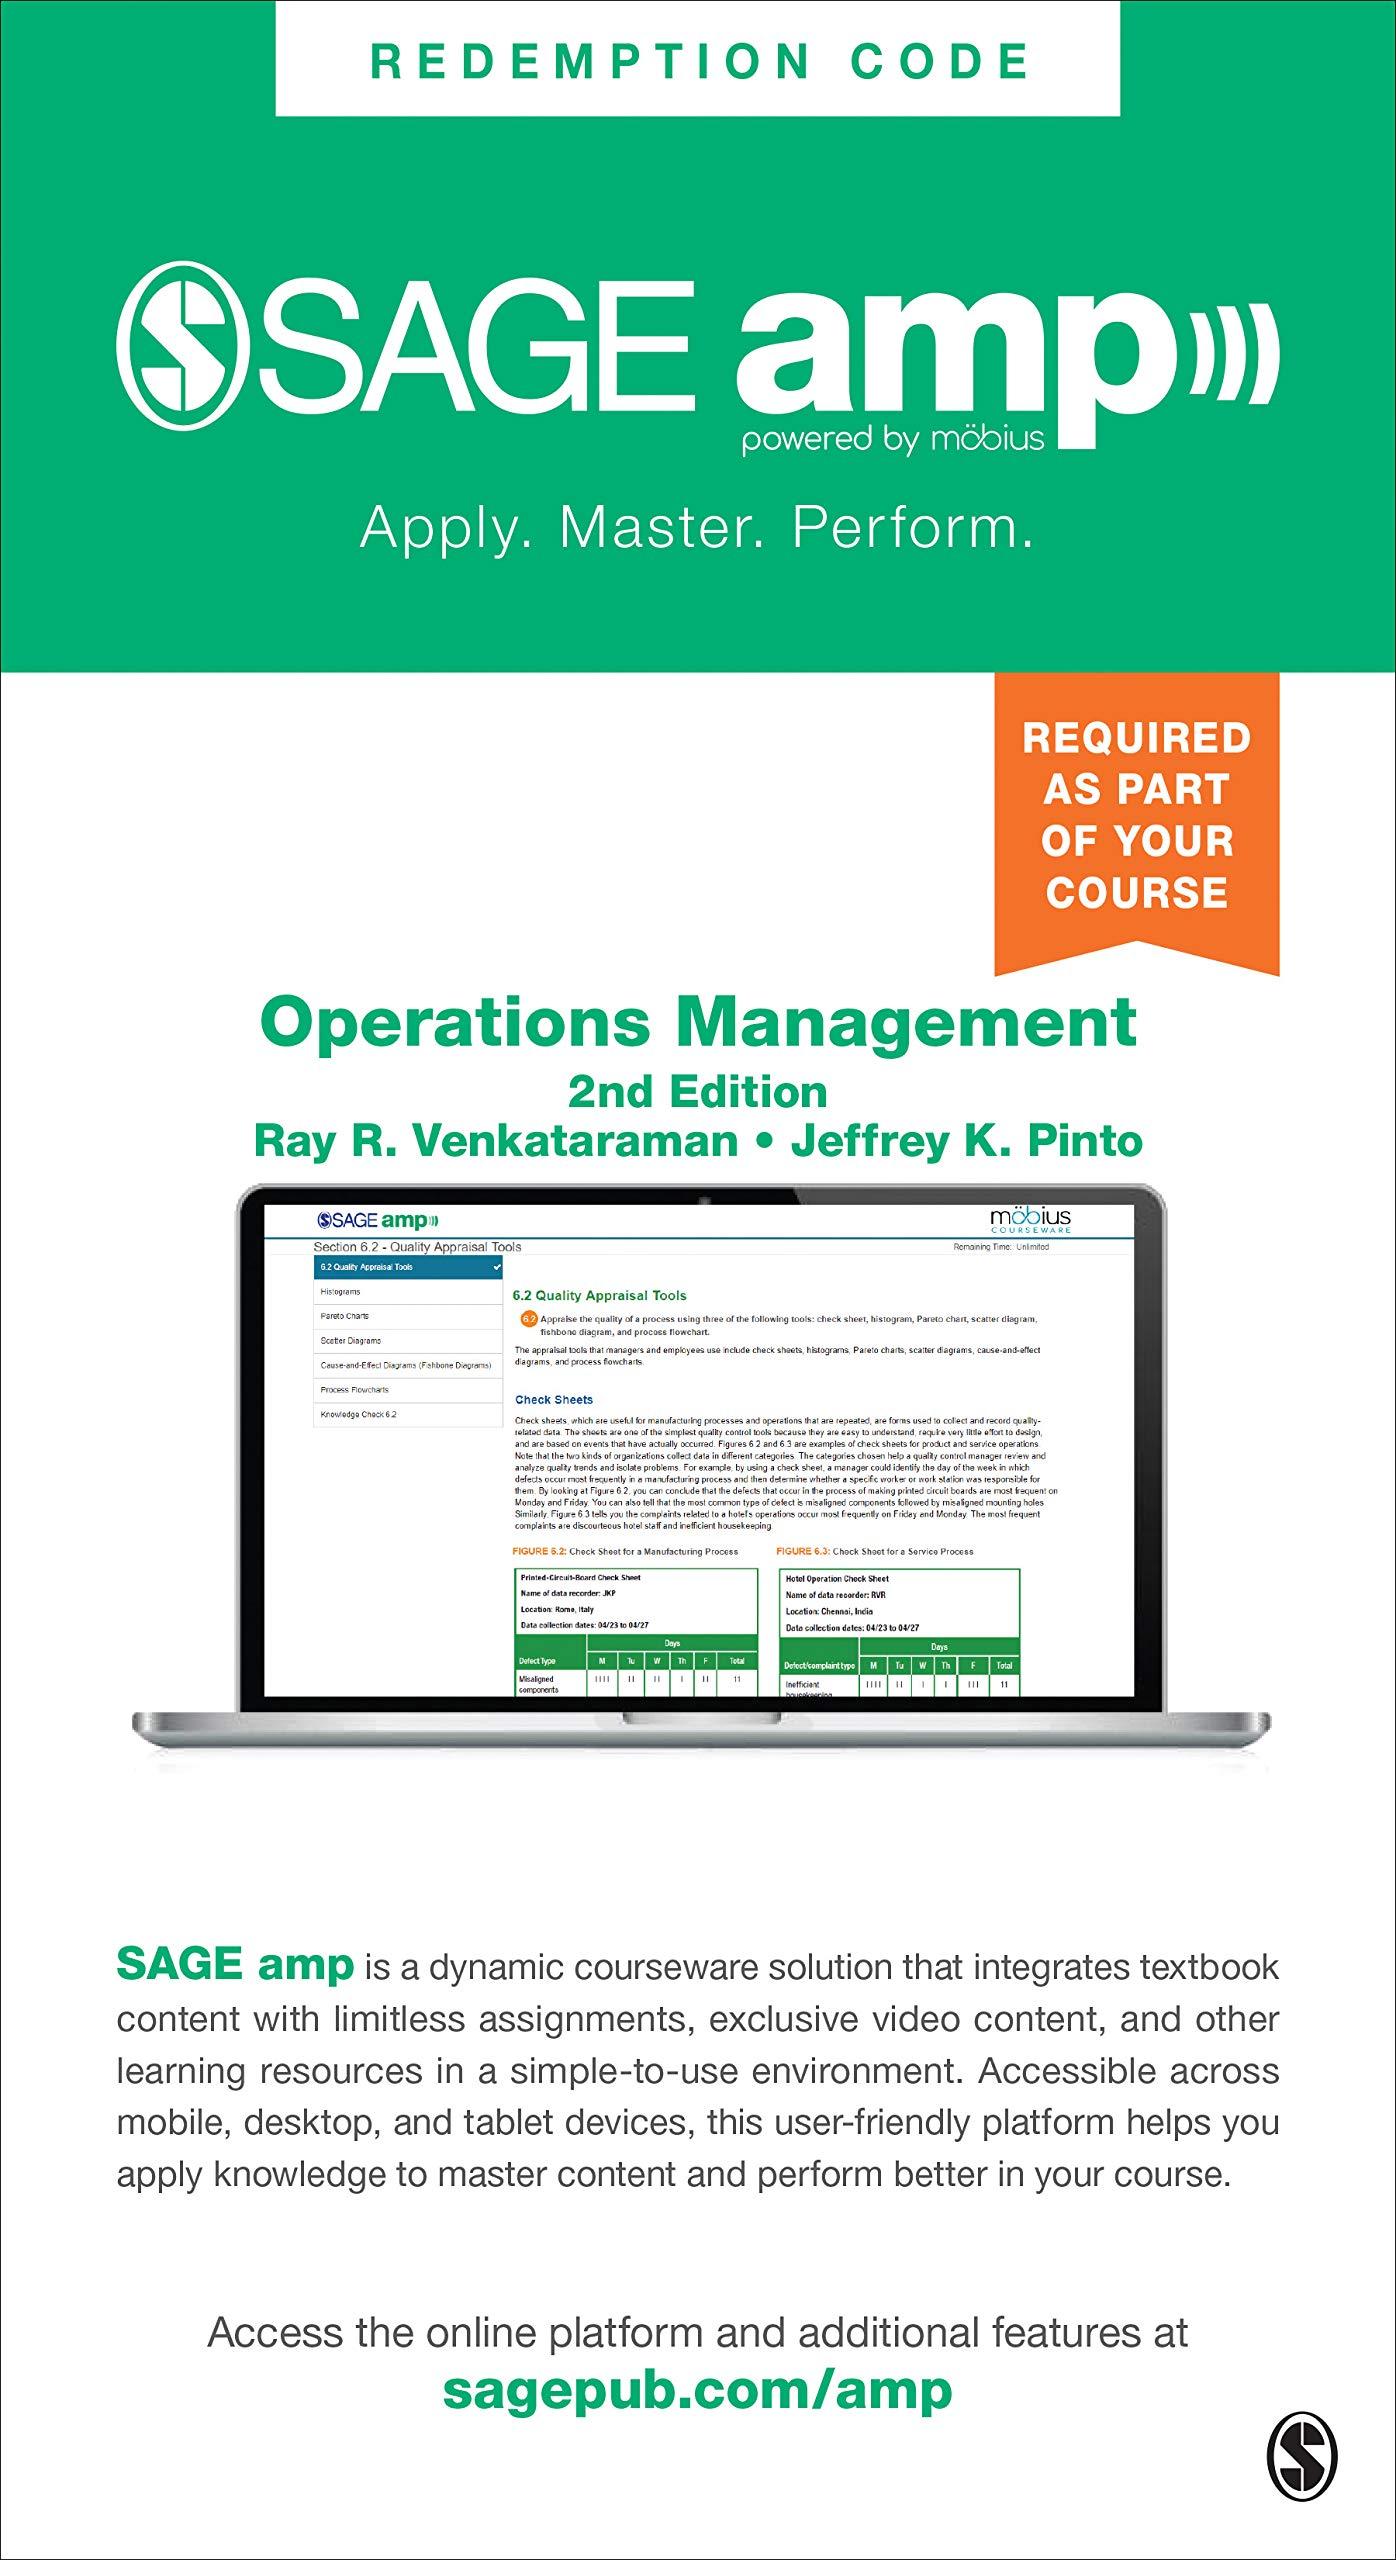 Operations Management - Sage Amp Edition: Managing Global